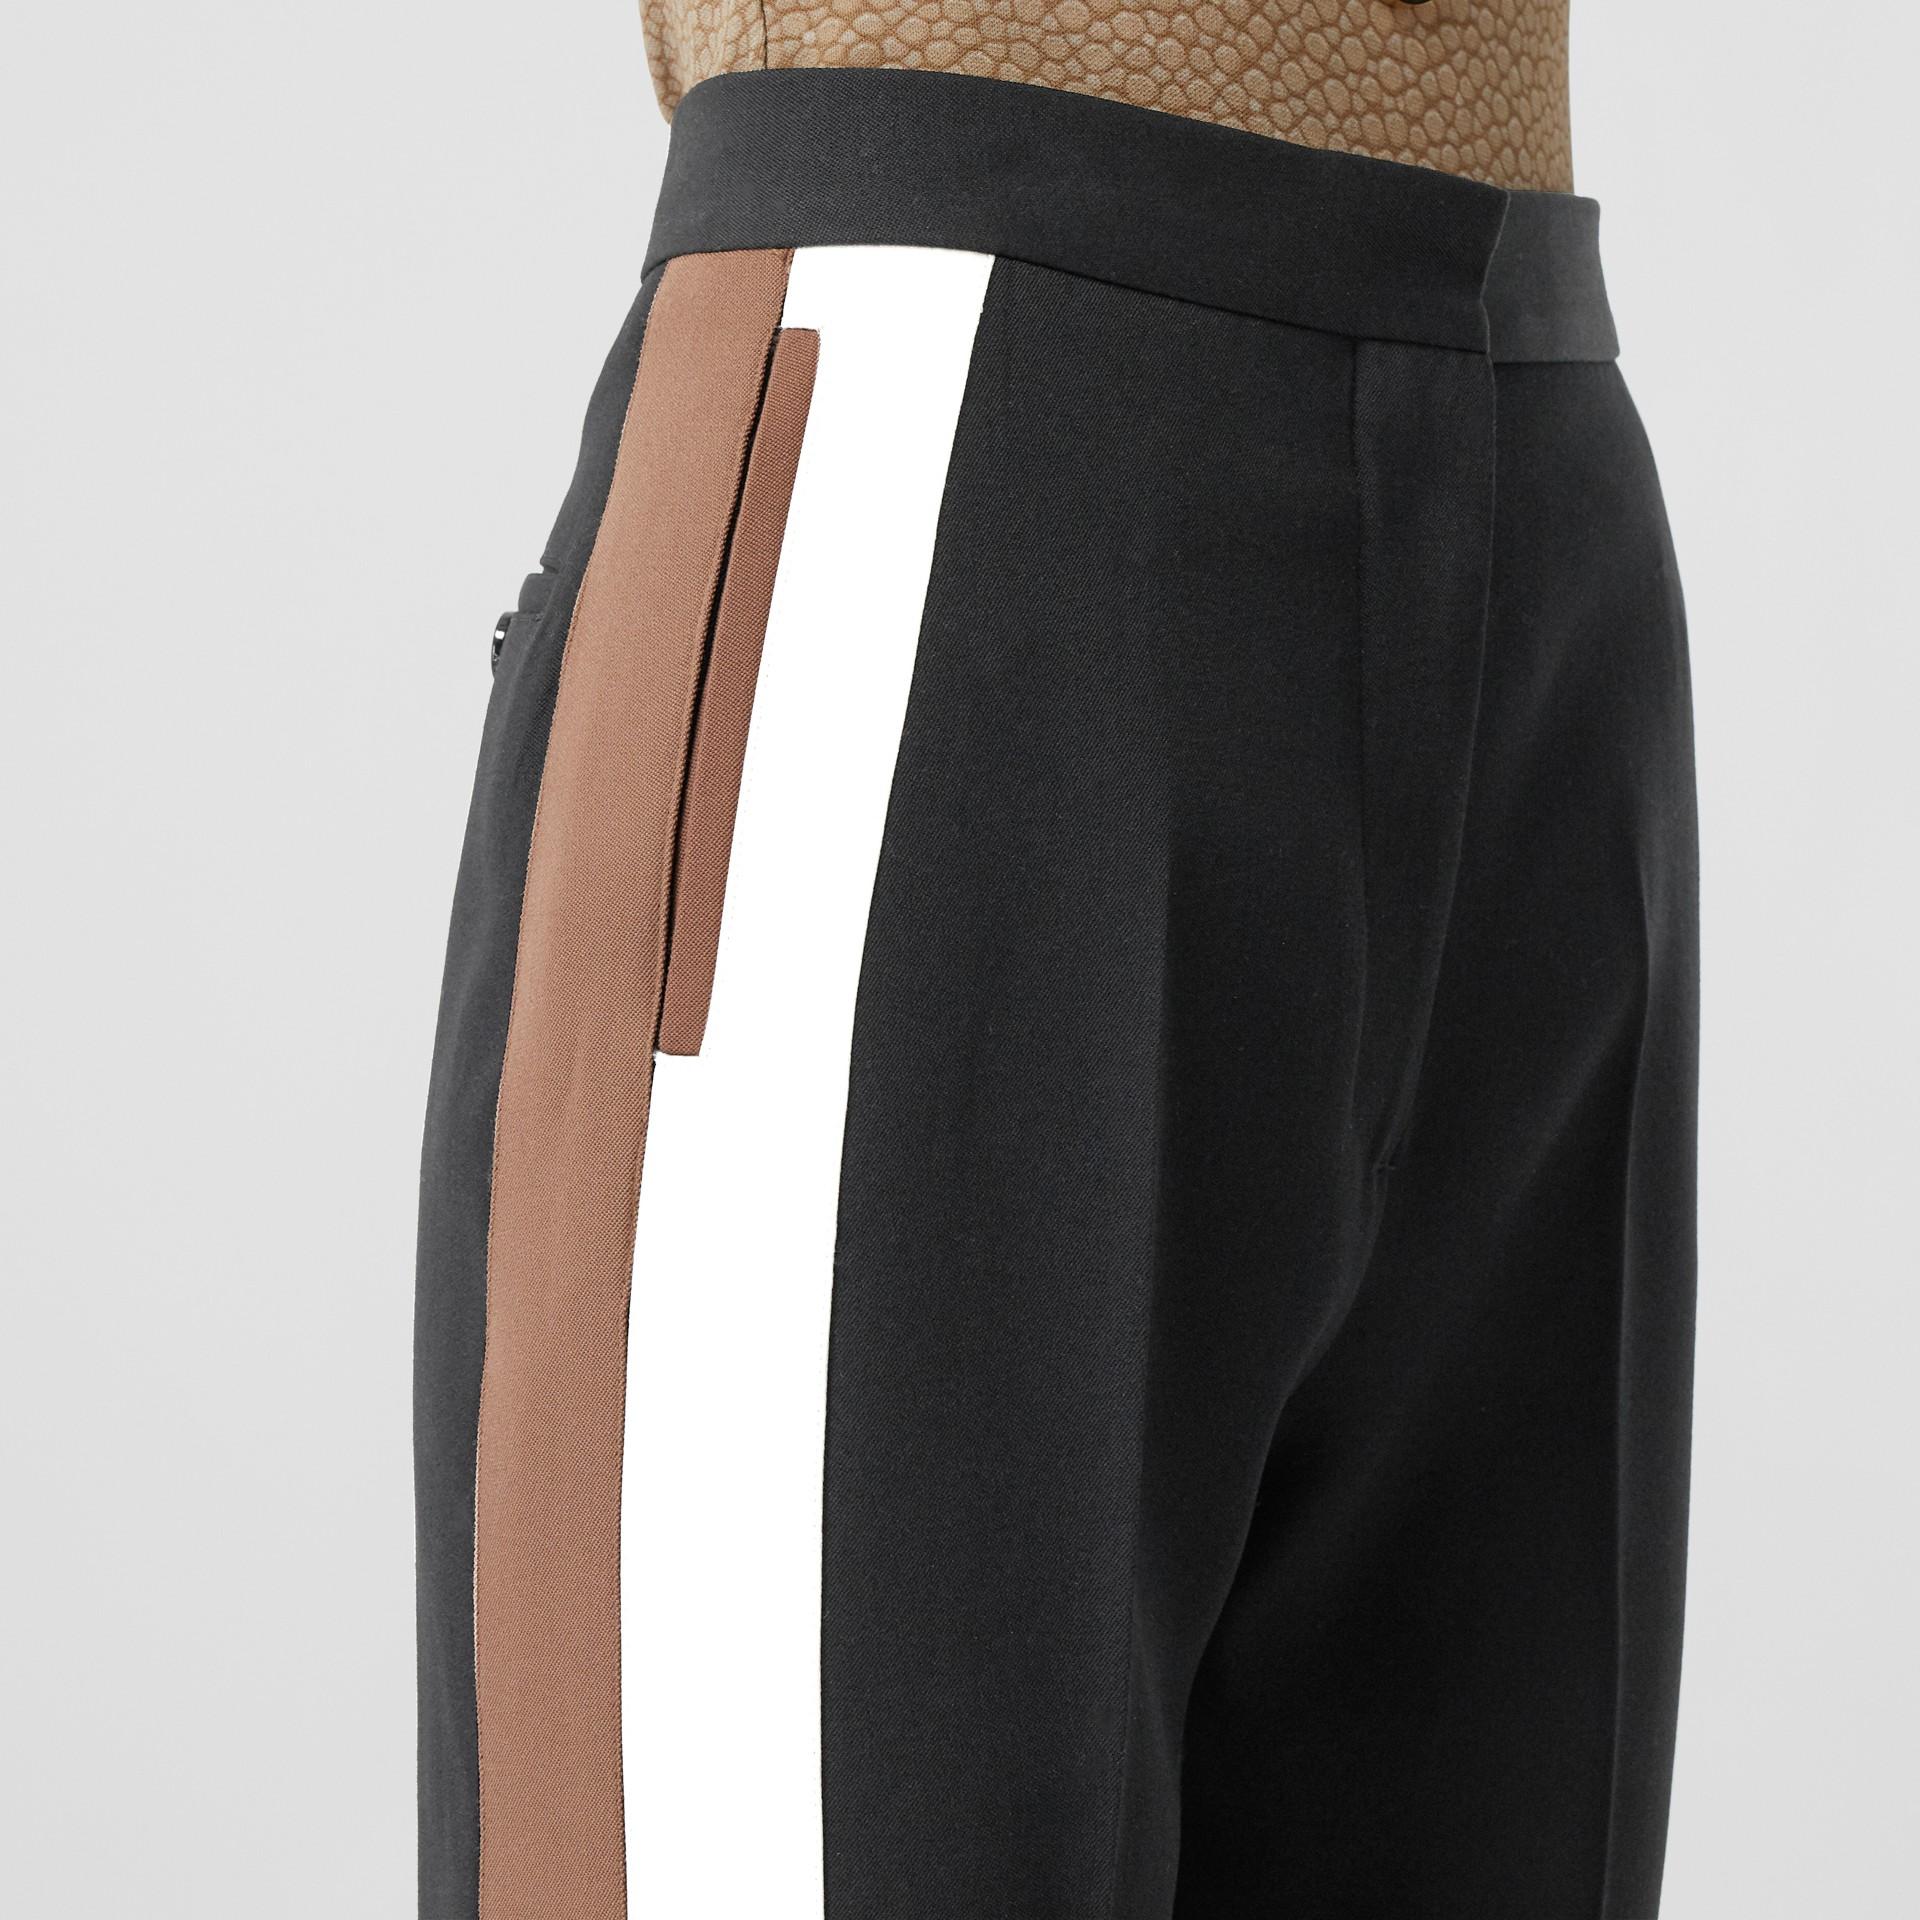 Stripe Detail Wool Tailored Trousers in Black - Women | Burberry United Kingdom - gallery image 5